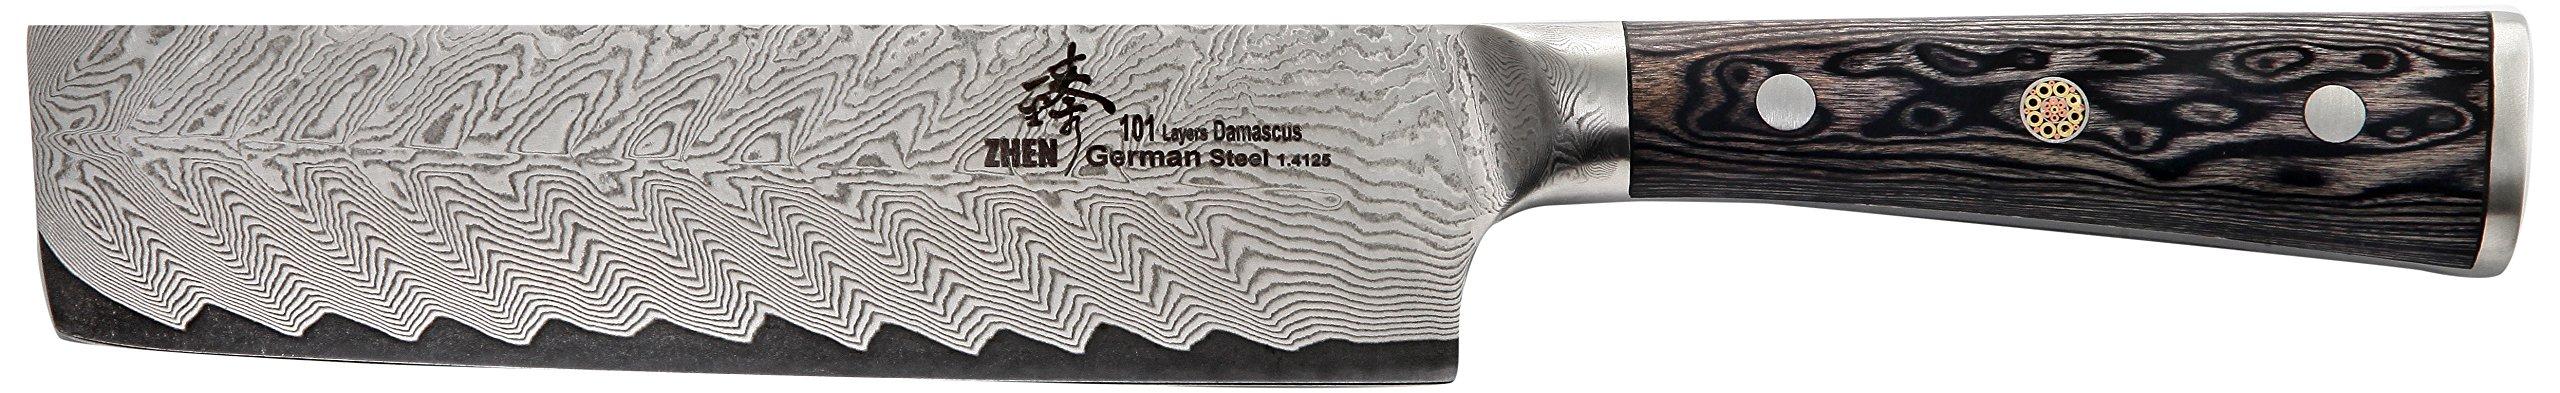 ZHEN Thunder Series 101 Layers German Damascus Steel Nakiri Knife 6.5-inch by ZHEN (Image #1)